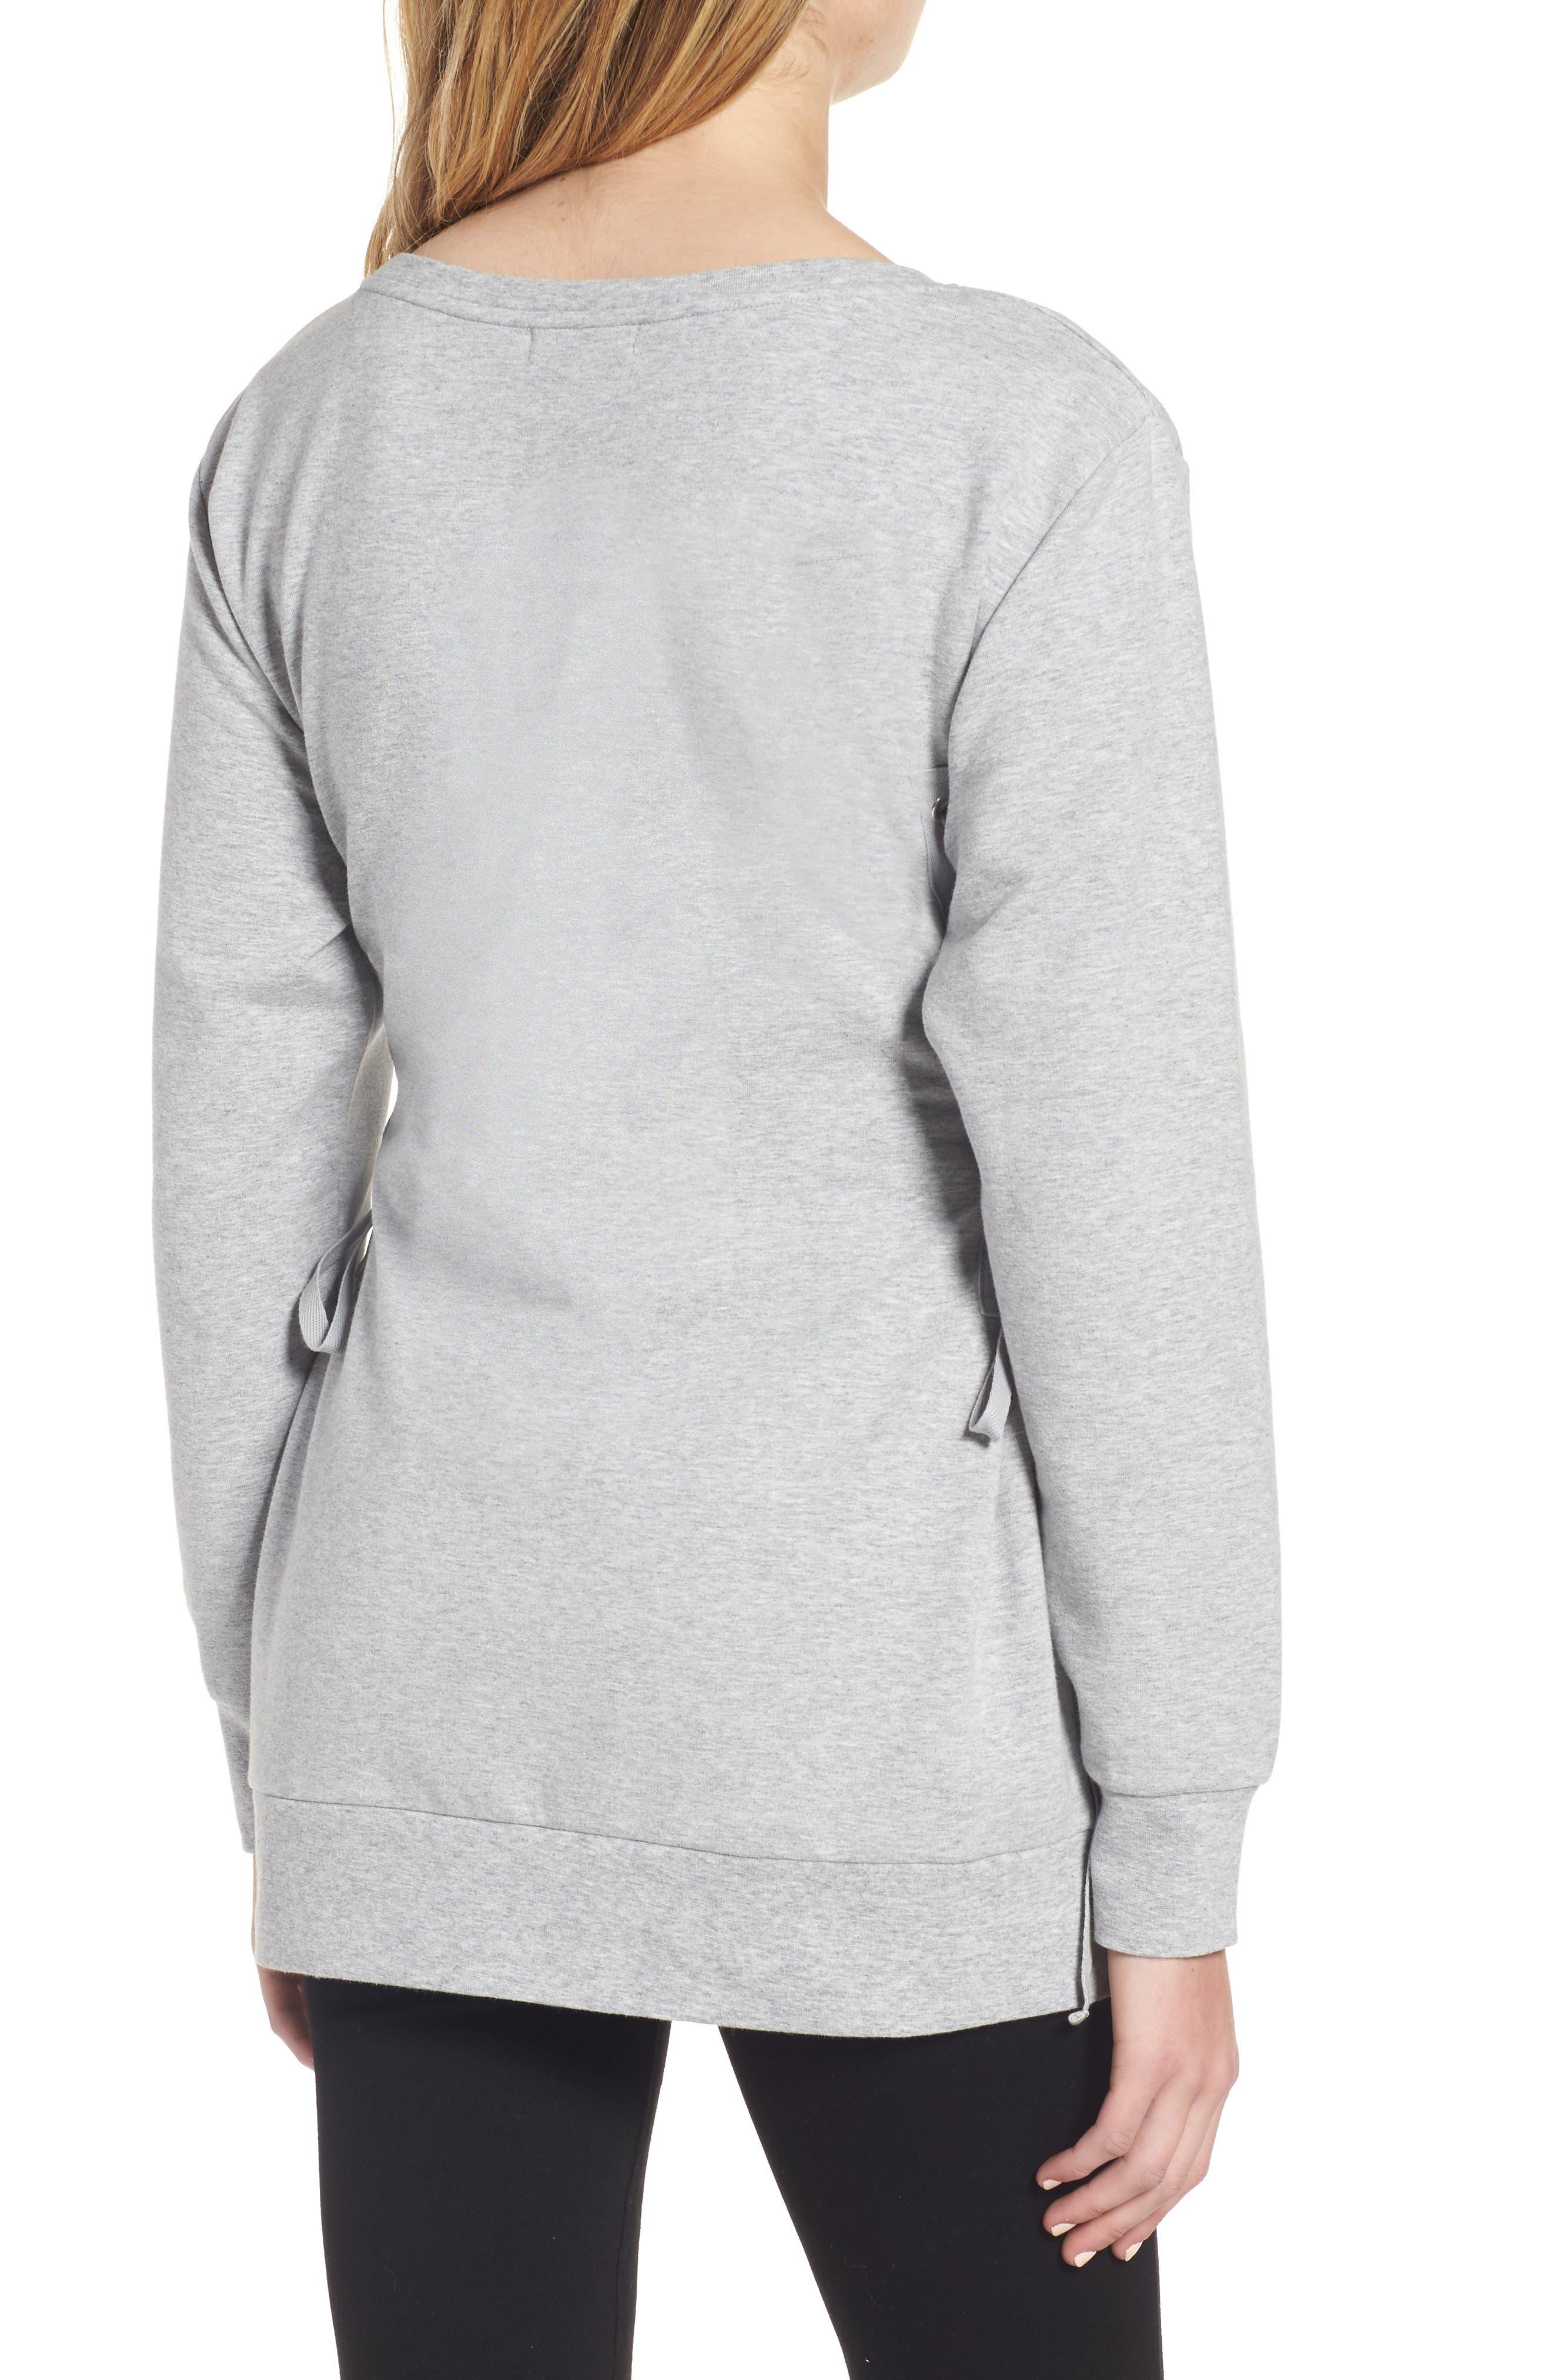 Corset Sweatshirt,                             Alternate thumbnail 2, color,                             Grey Heather